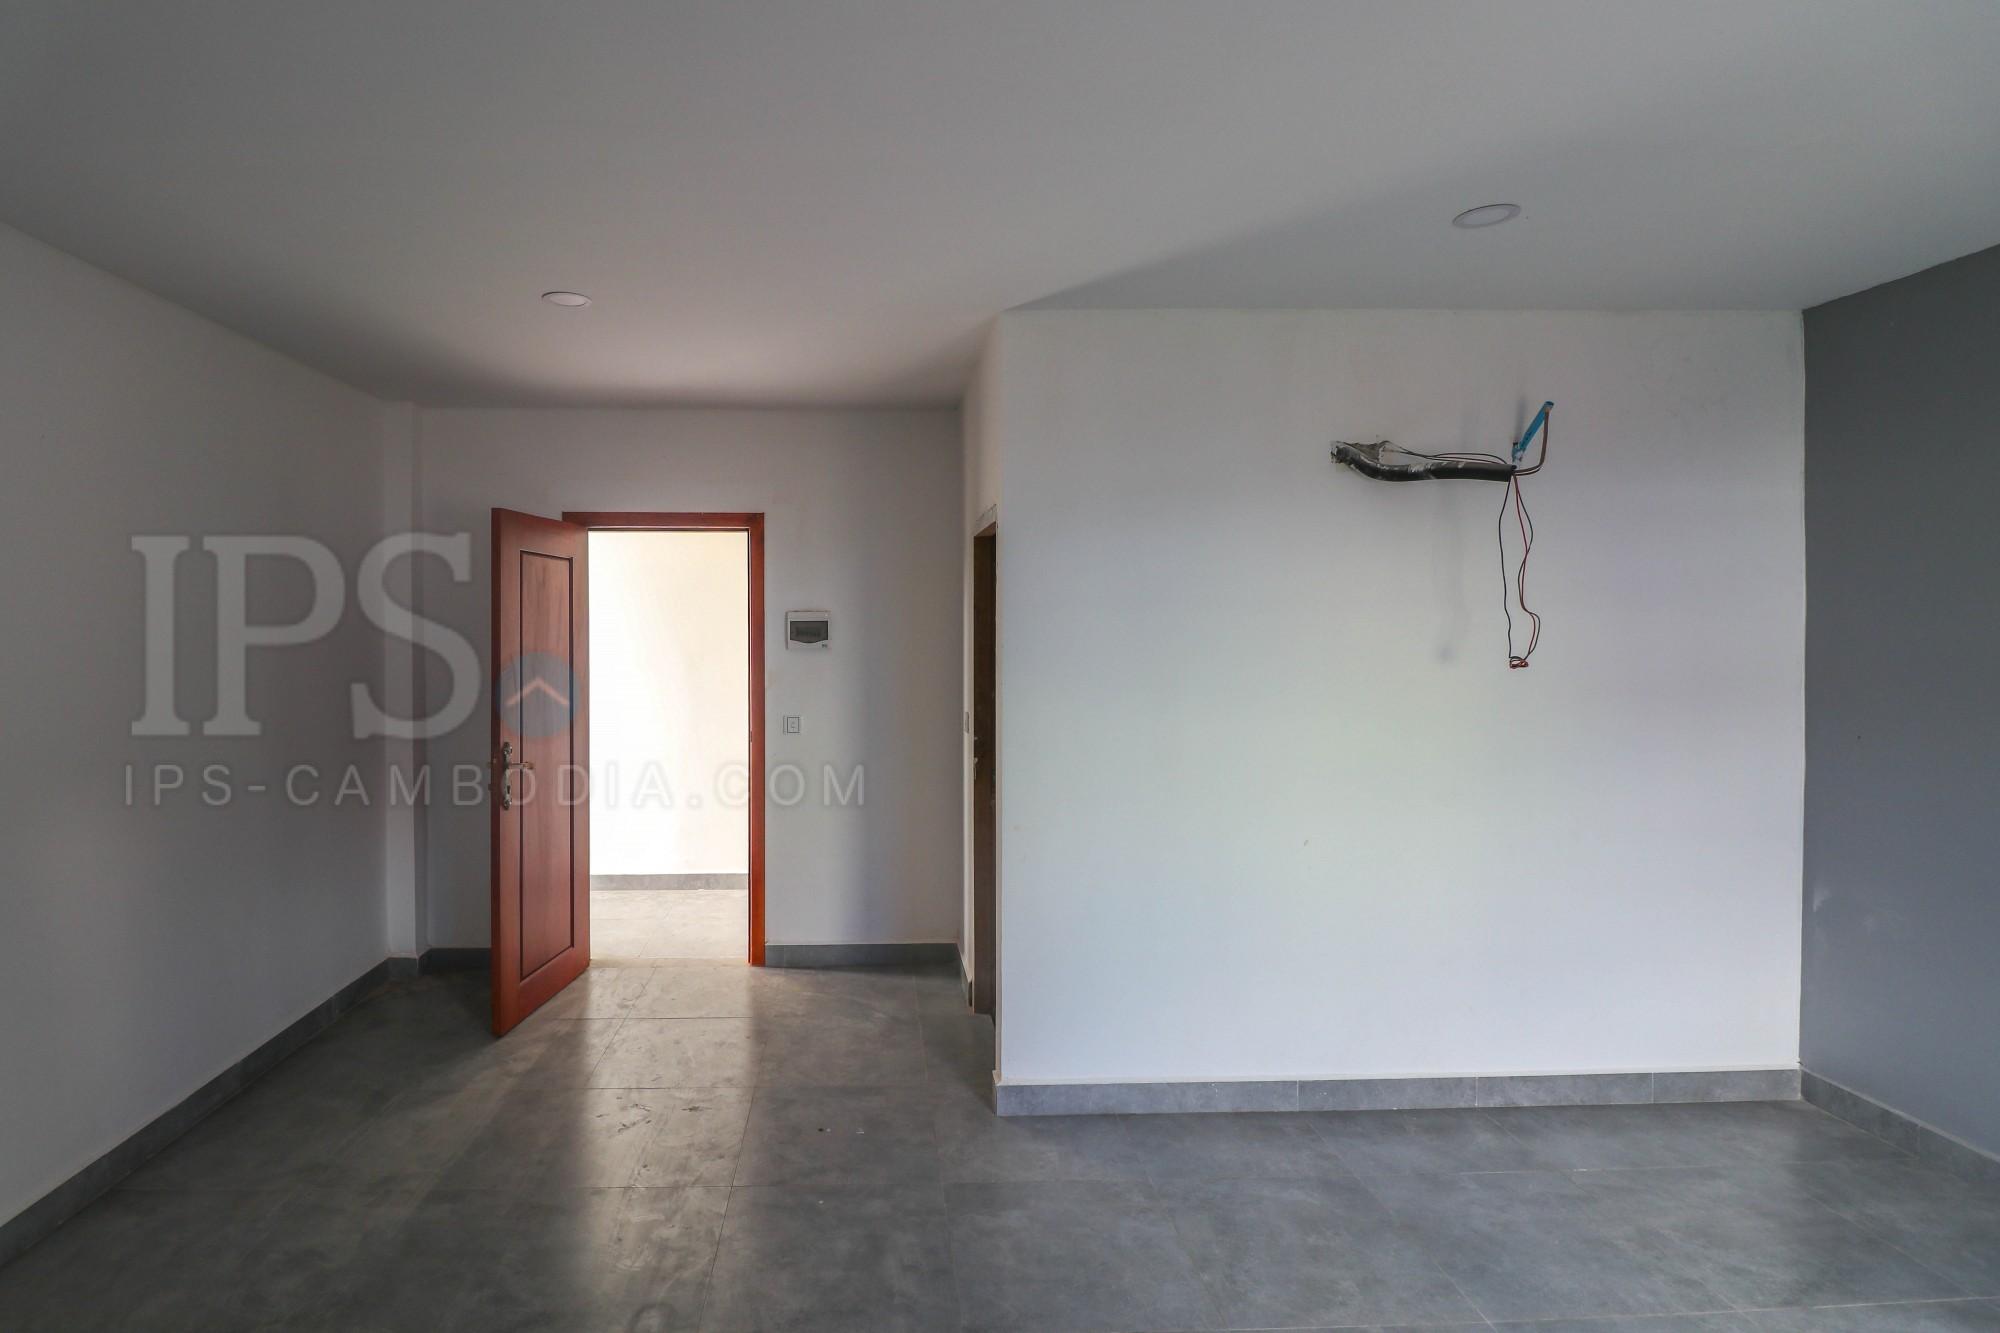 36 Bedroom Building For Rent - Mittapheap, Sihanoukville